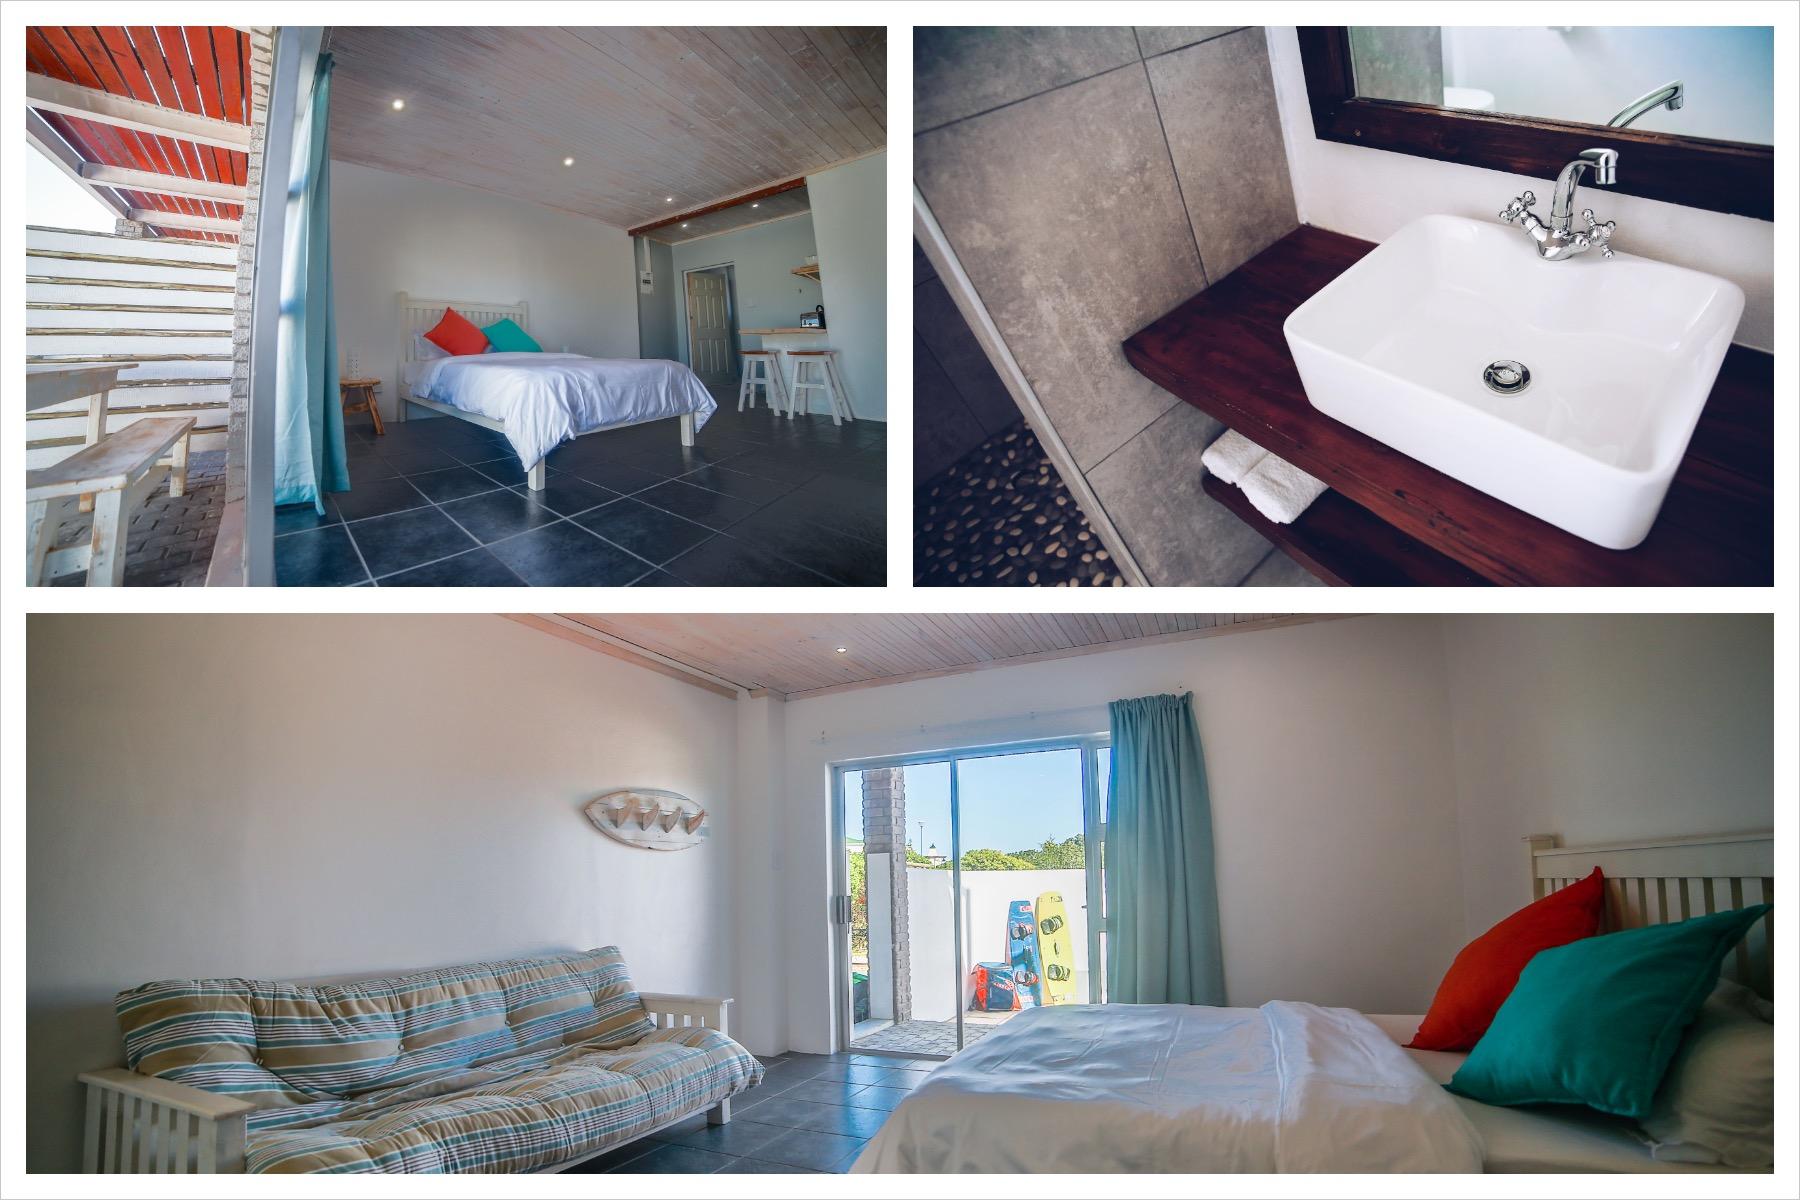 Accommodation Langebaan South Africa, Self-catering accommodation langebaan